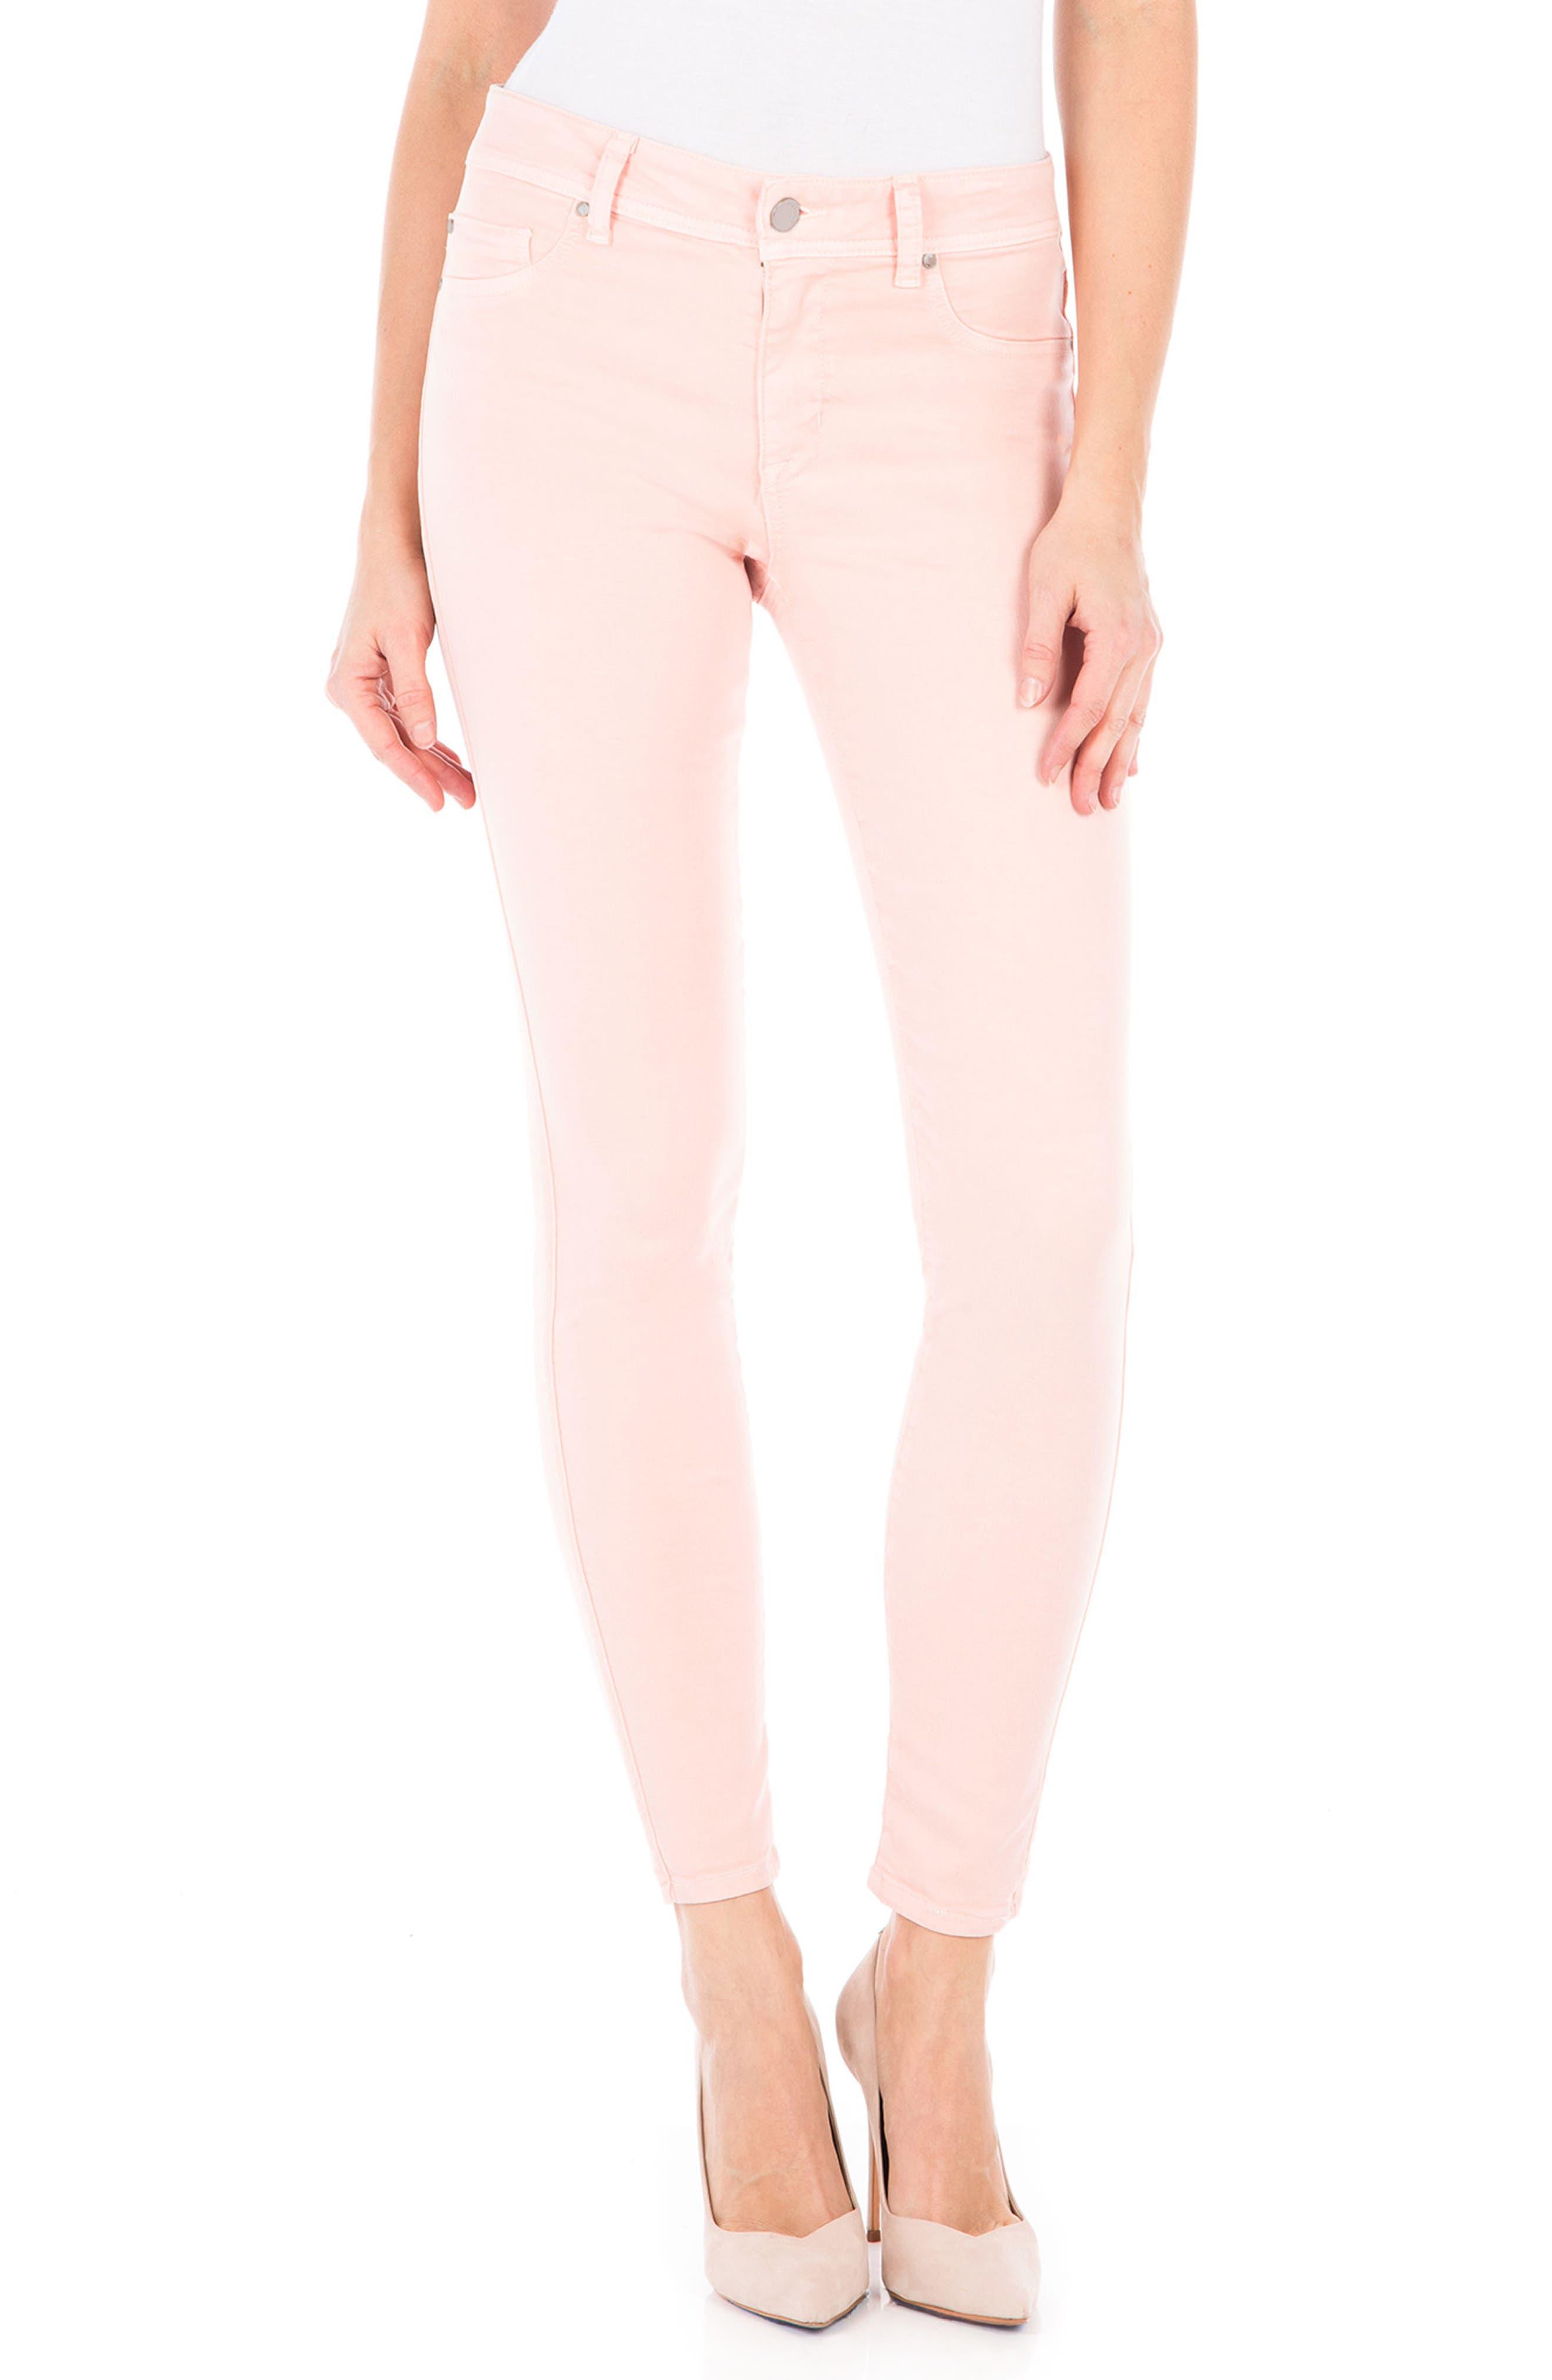 Sola Skinny Jeans,                             Main thumbnail 1, color,                             650